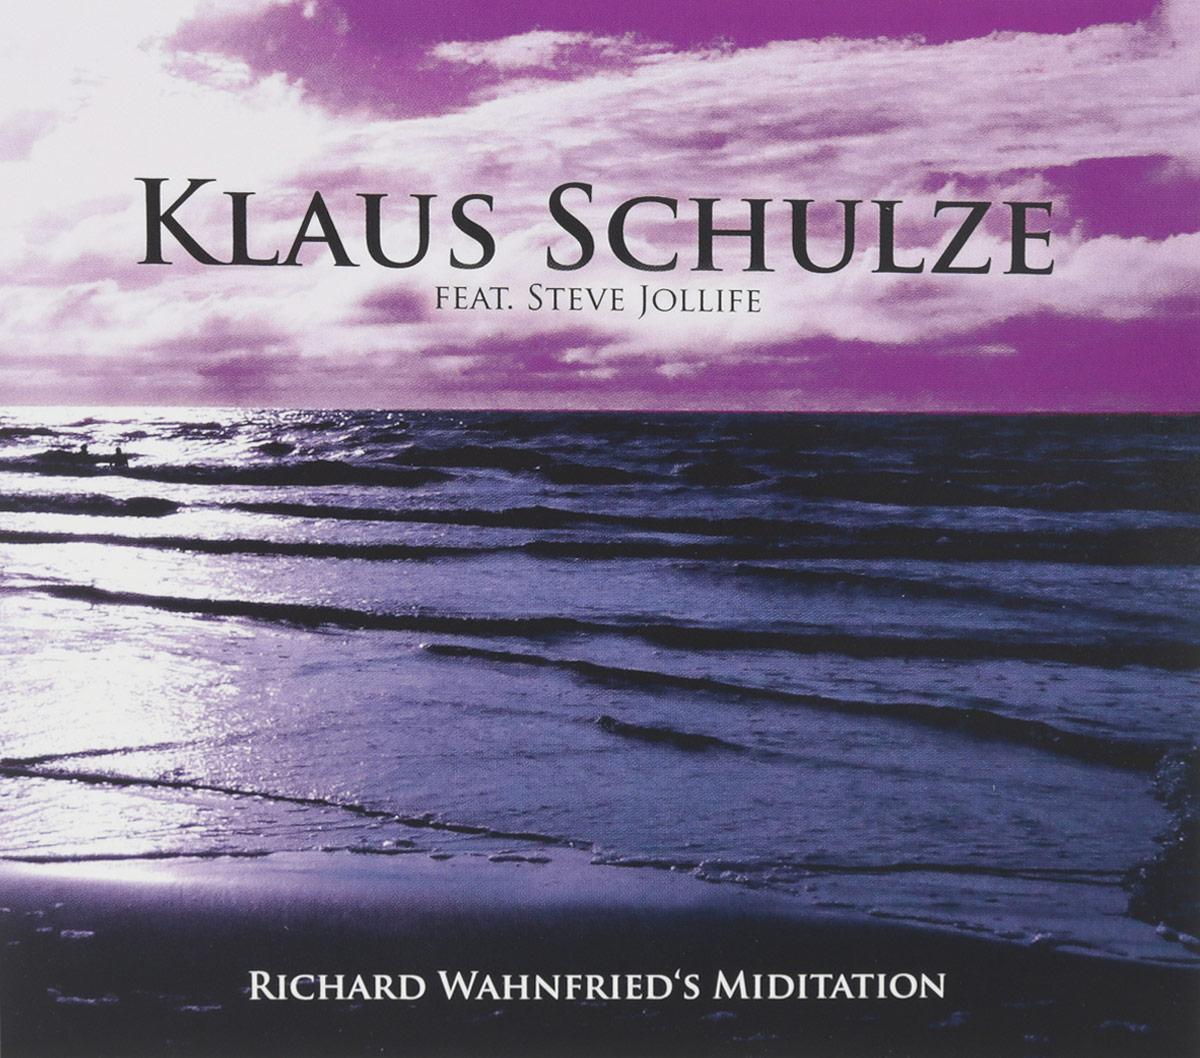 Klaus Schulze Feat. Steve Jollife. Richard Wahnfried's Miditation 2016 Audio CD